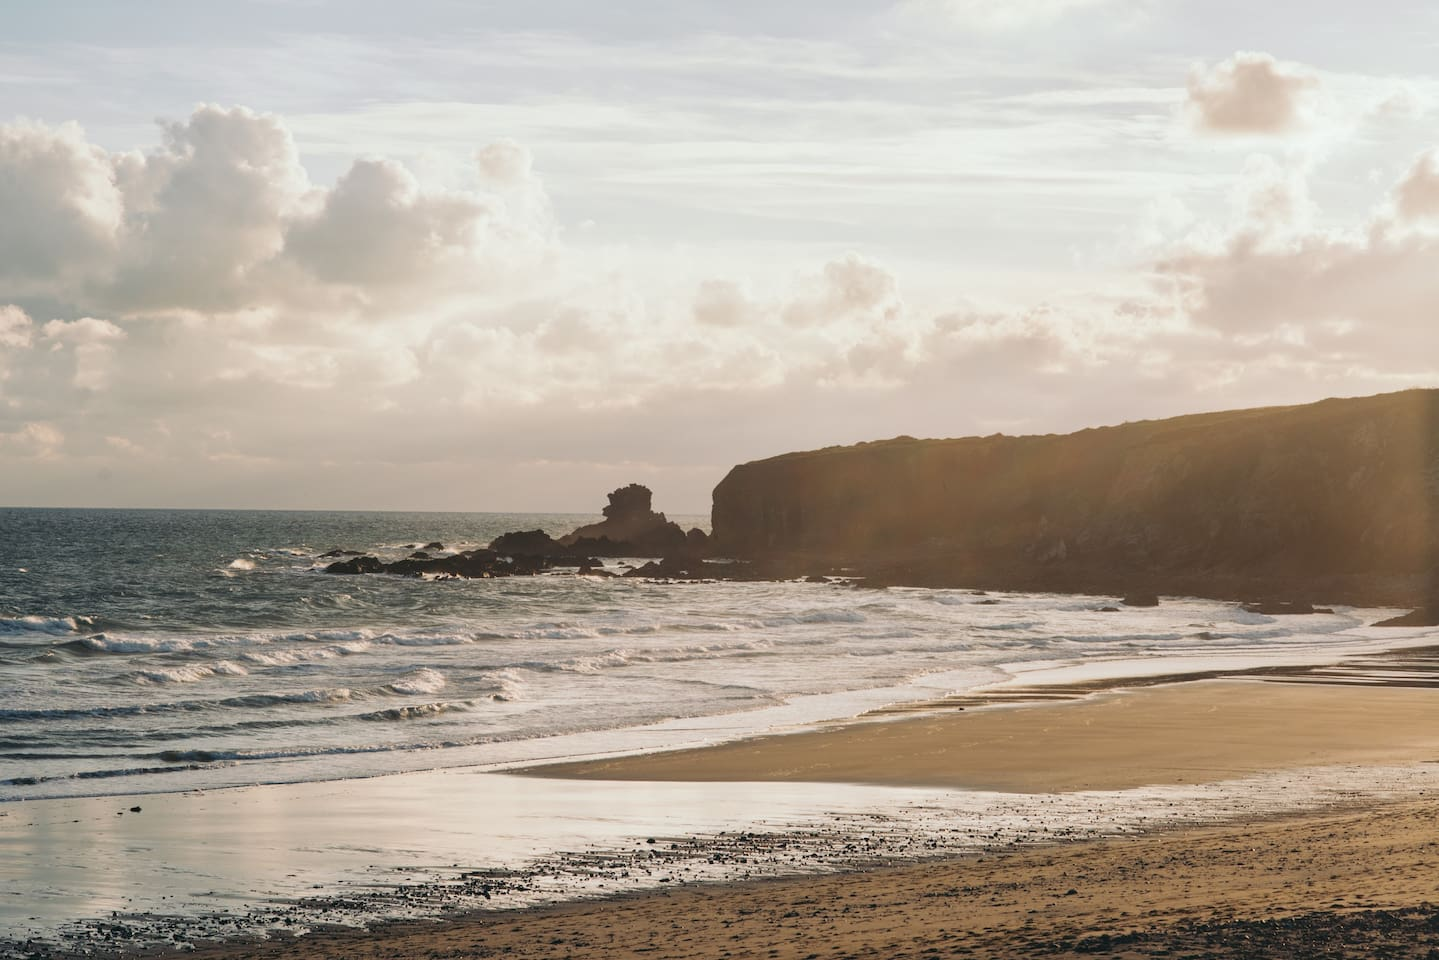 The coastline is full of beautiful beaches